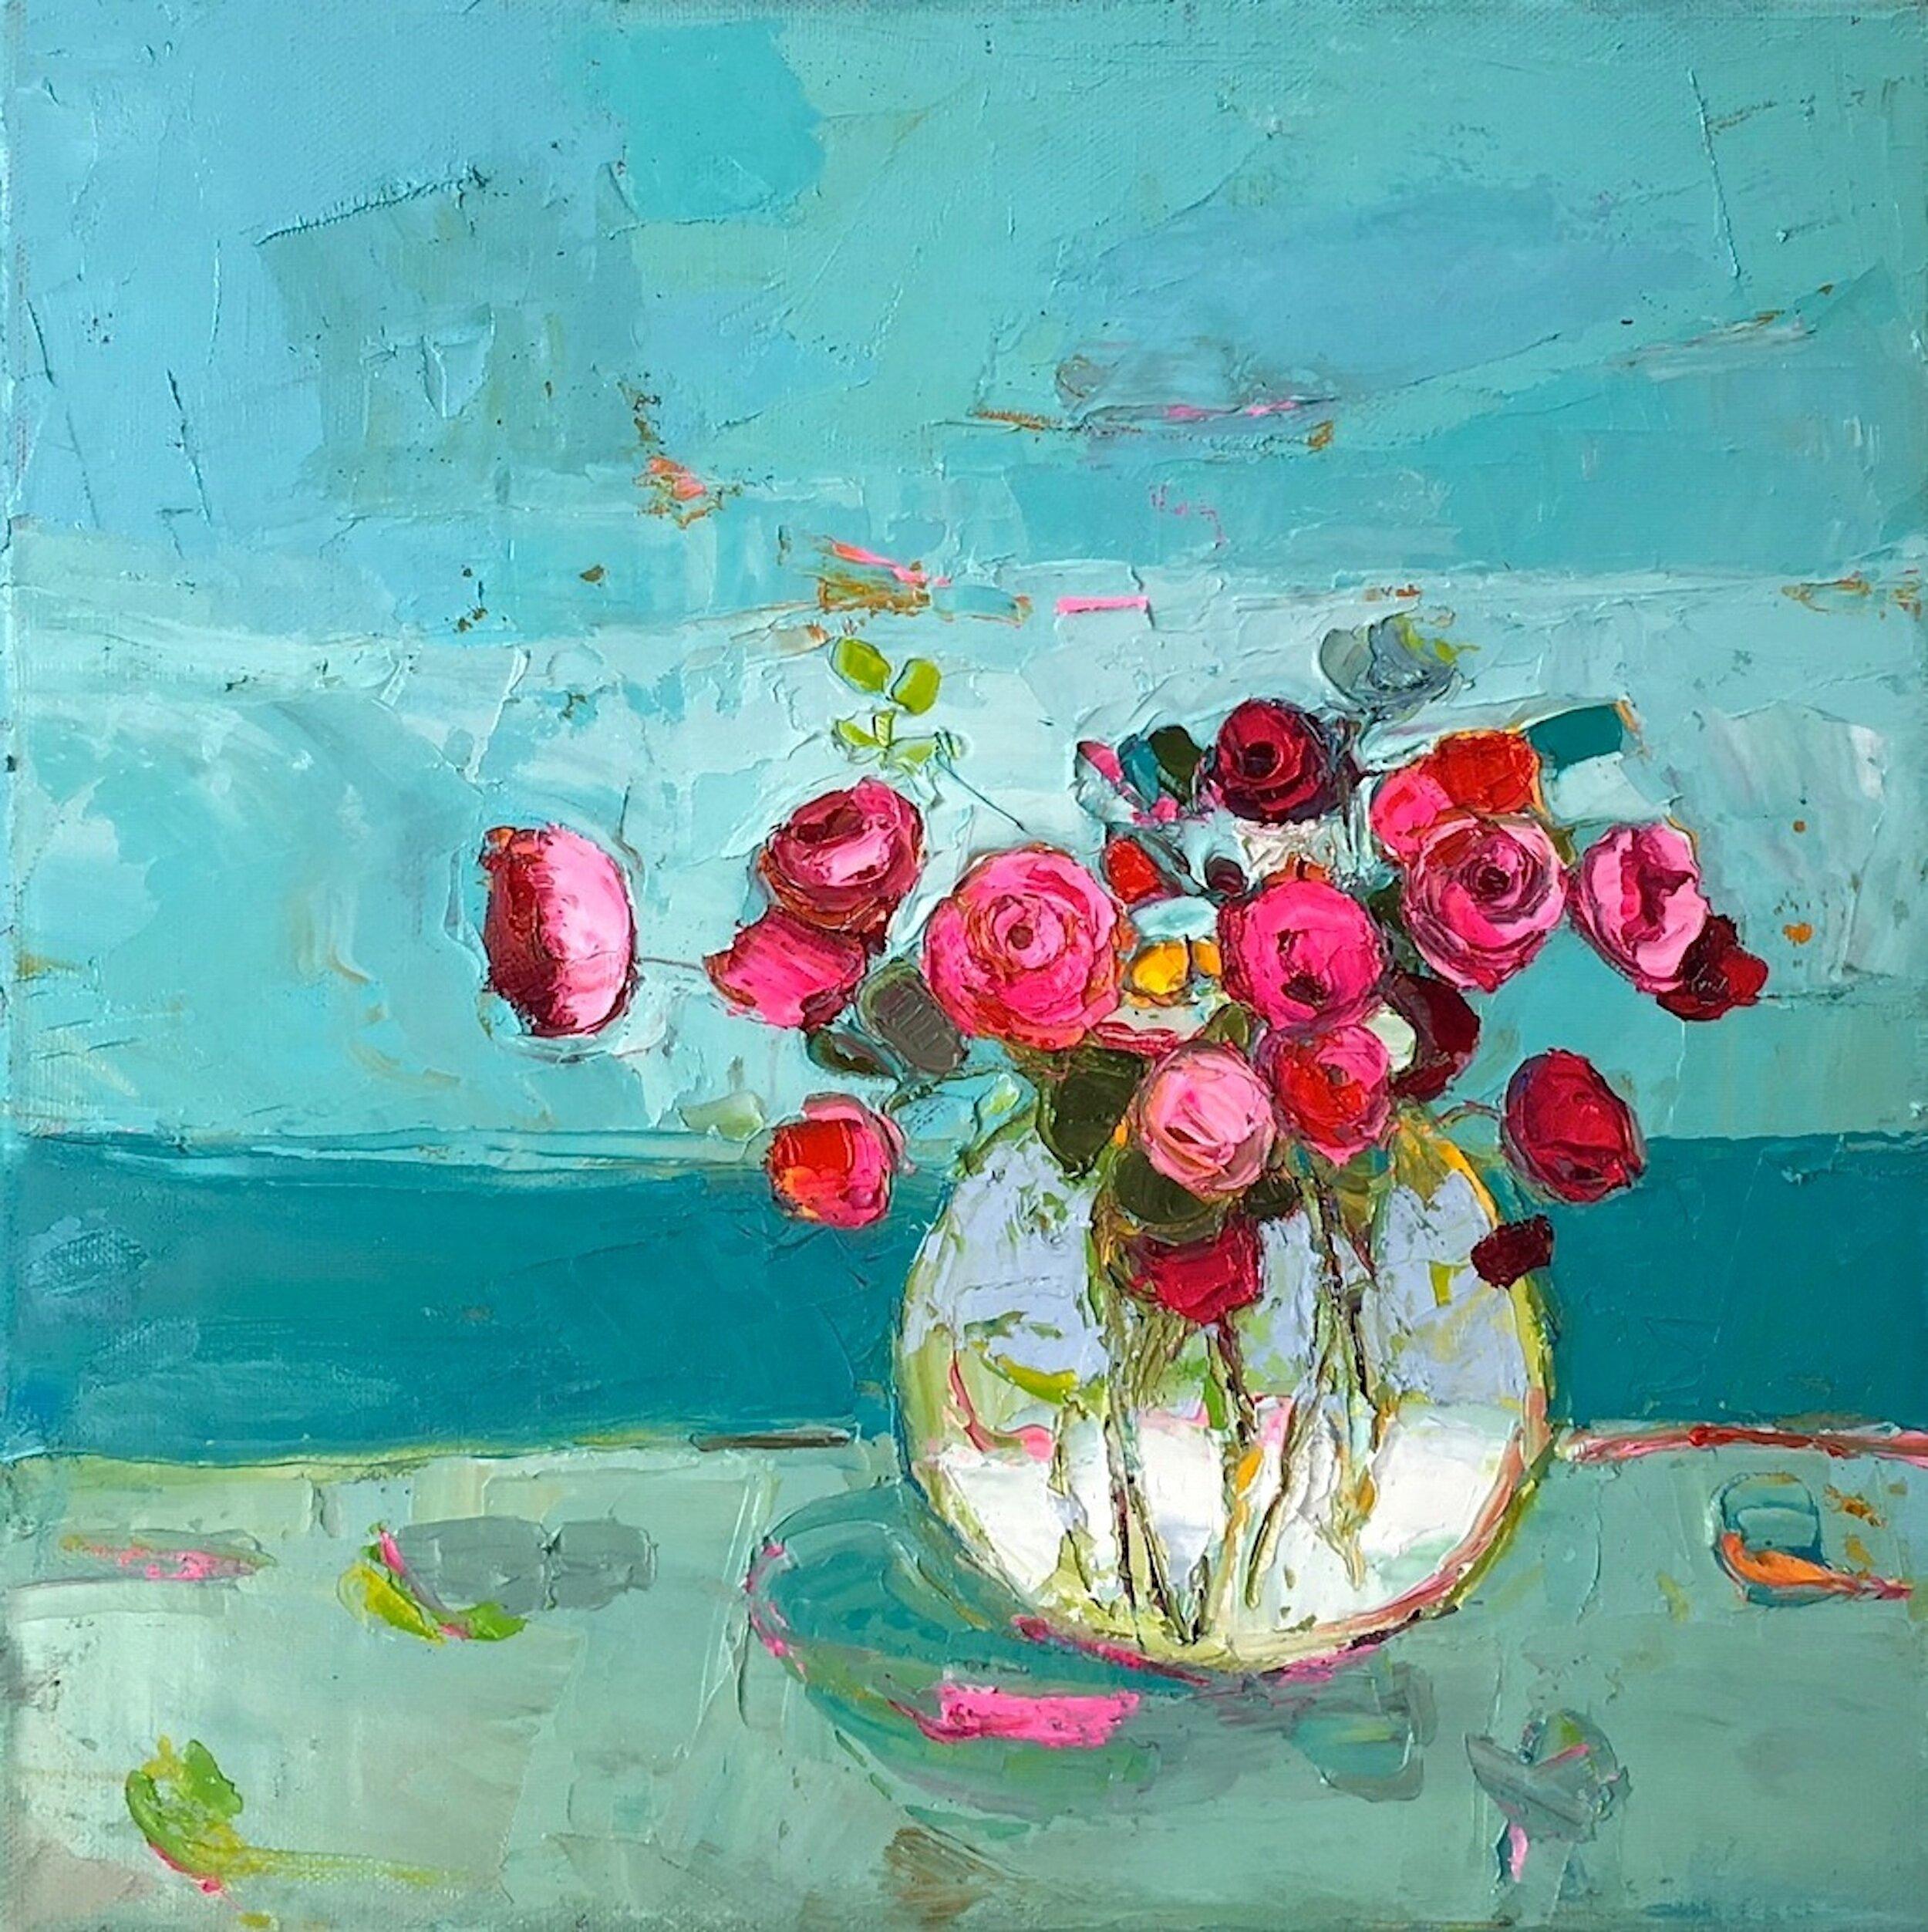 Title: Still Blue Sea  Size: 12x12  Medium: Oil on Canvas  Price: £1700